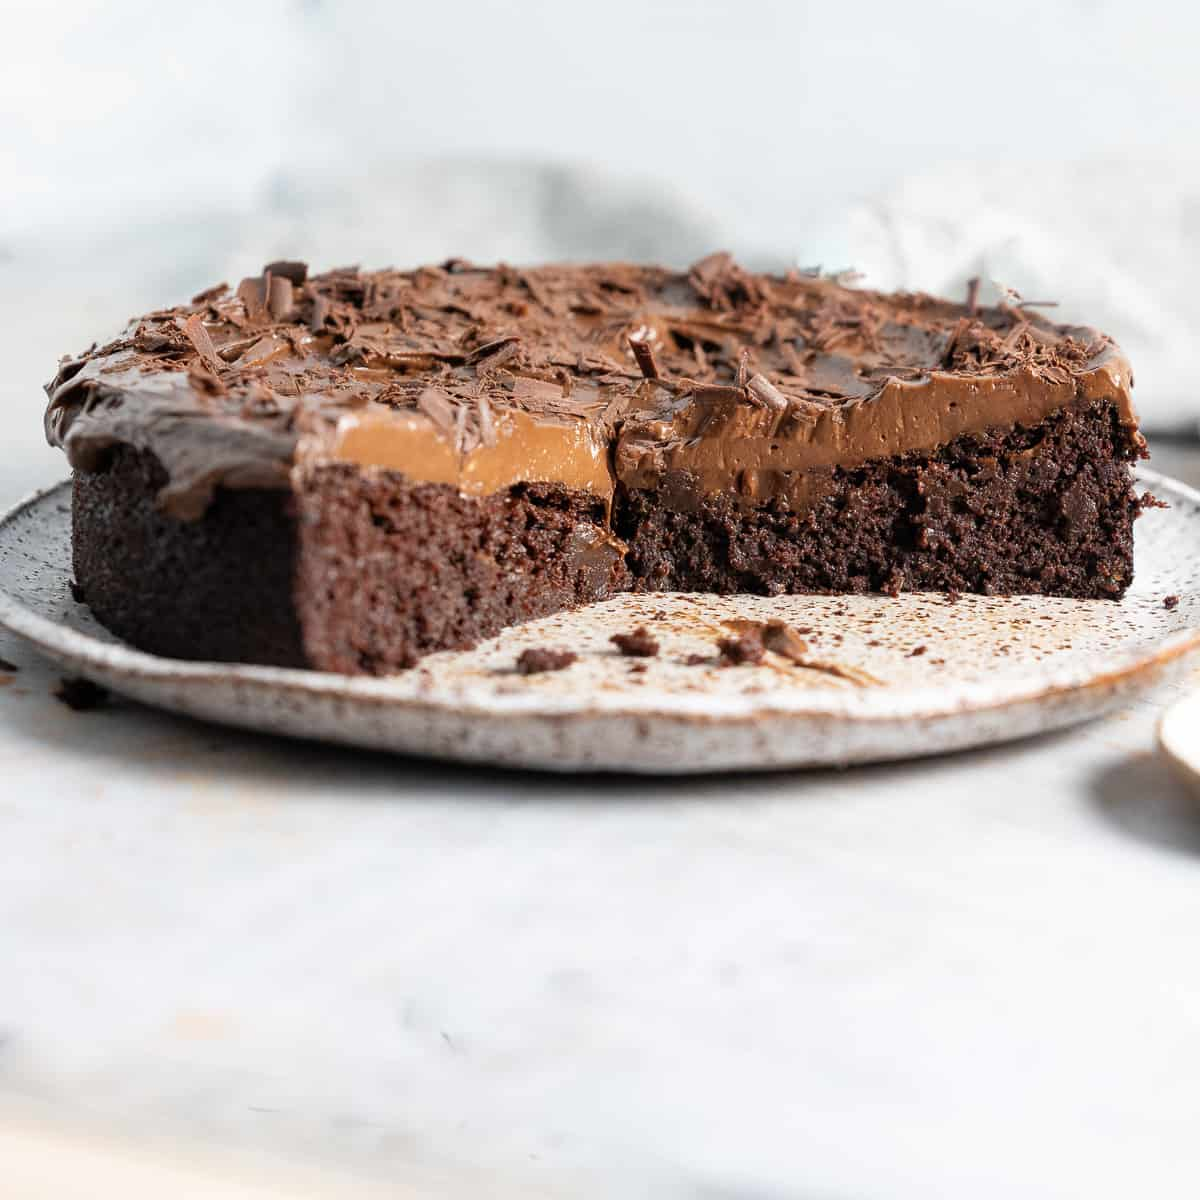 half a Black bean chocolate cake on a plate